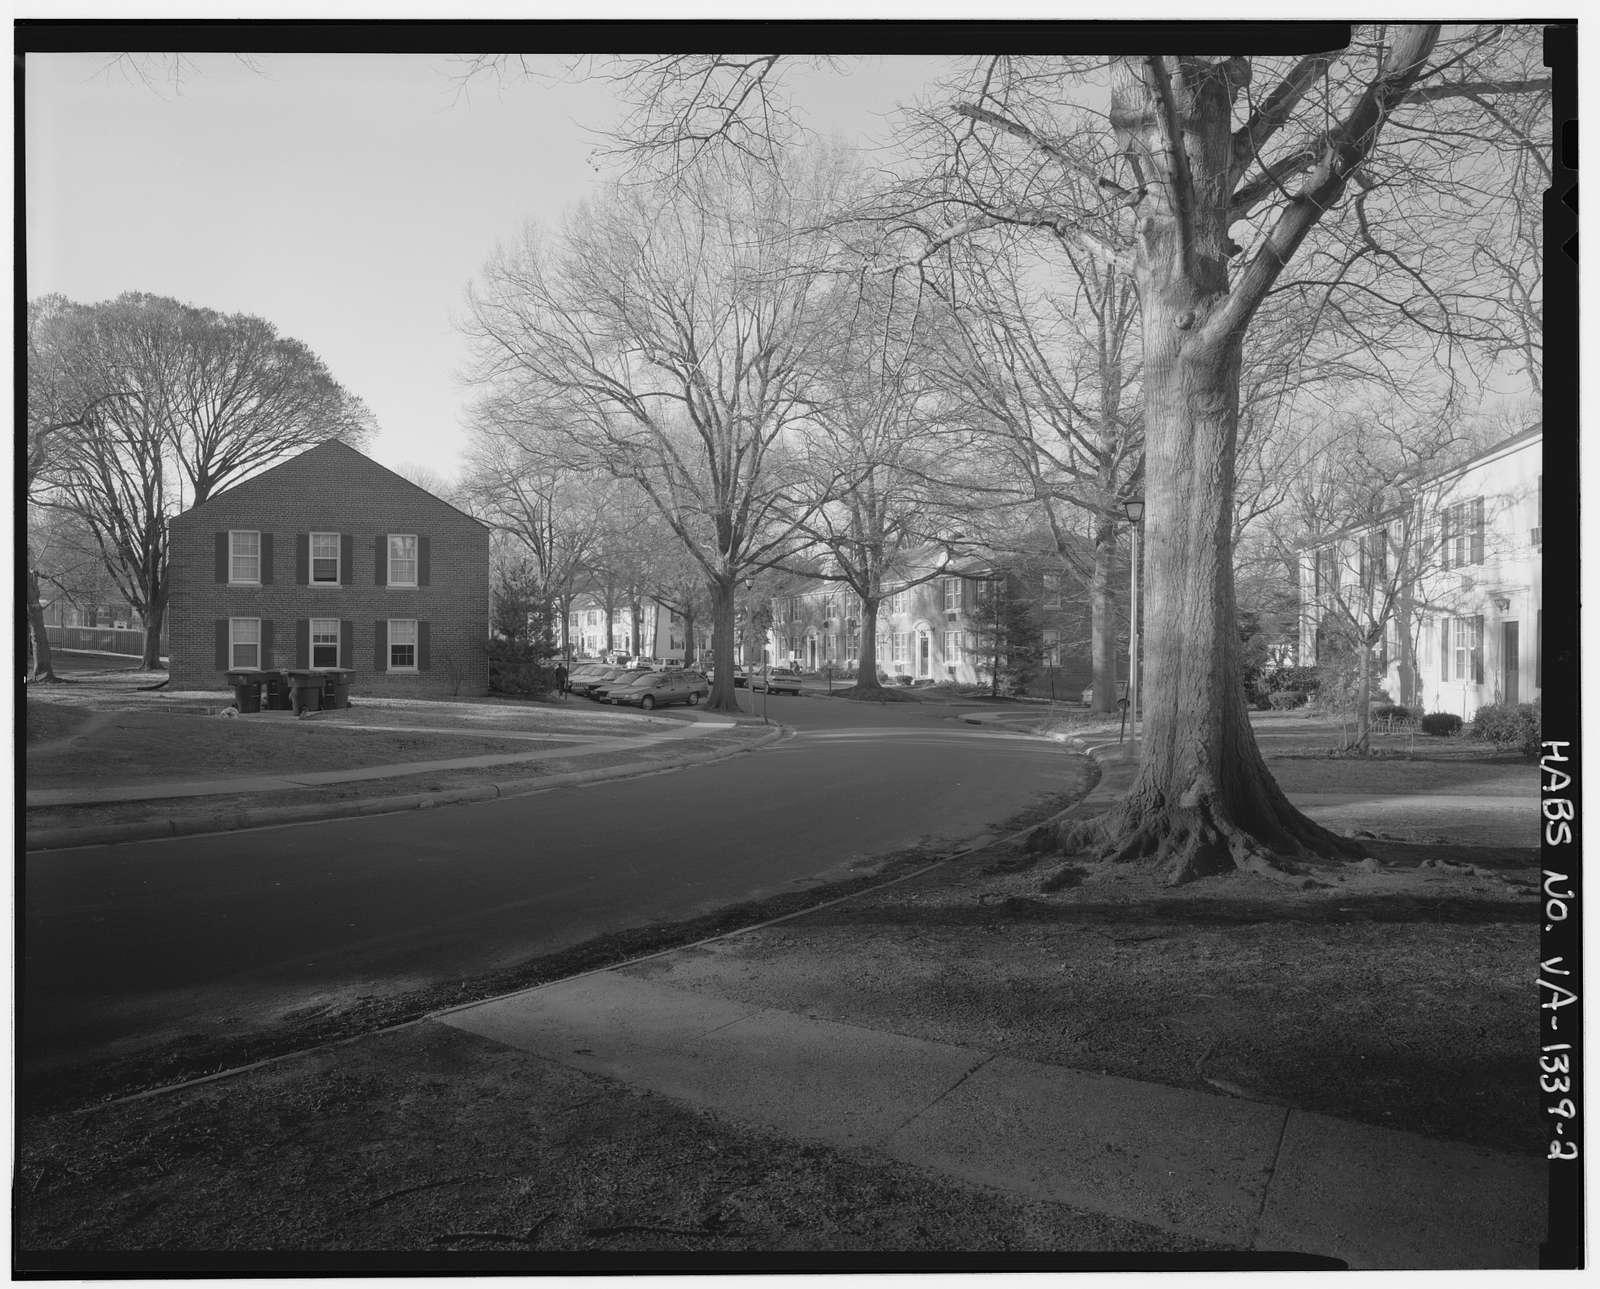 Buckingham Apartment Complex, Bounded by George Mason Drive, Henderson, Glebe, & Pershing Roads, Arlington, Arlington County, VA